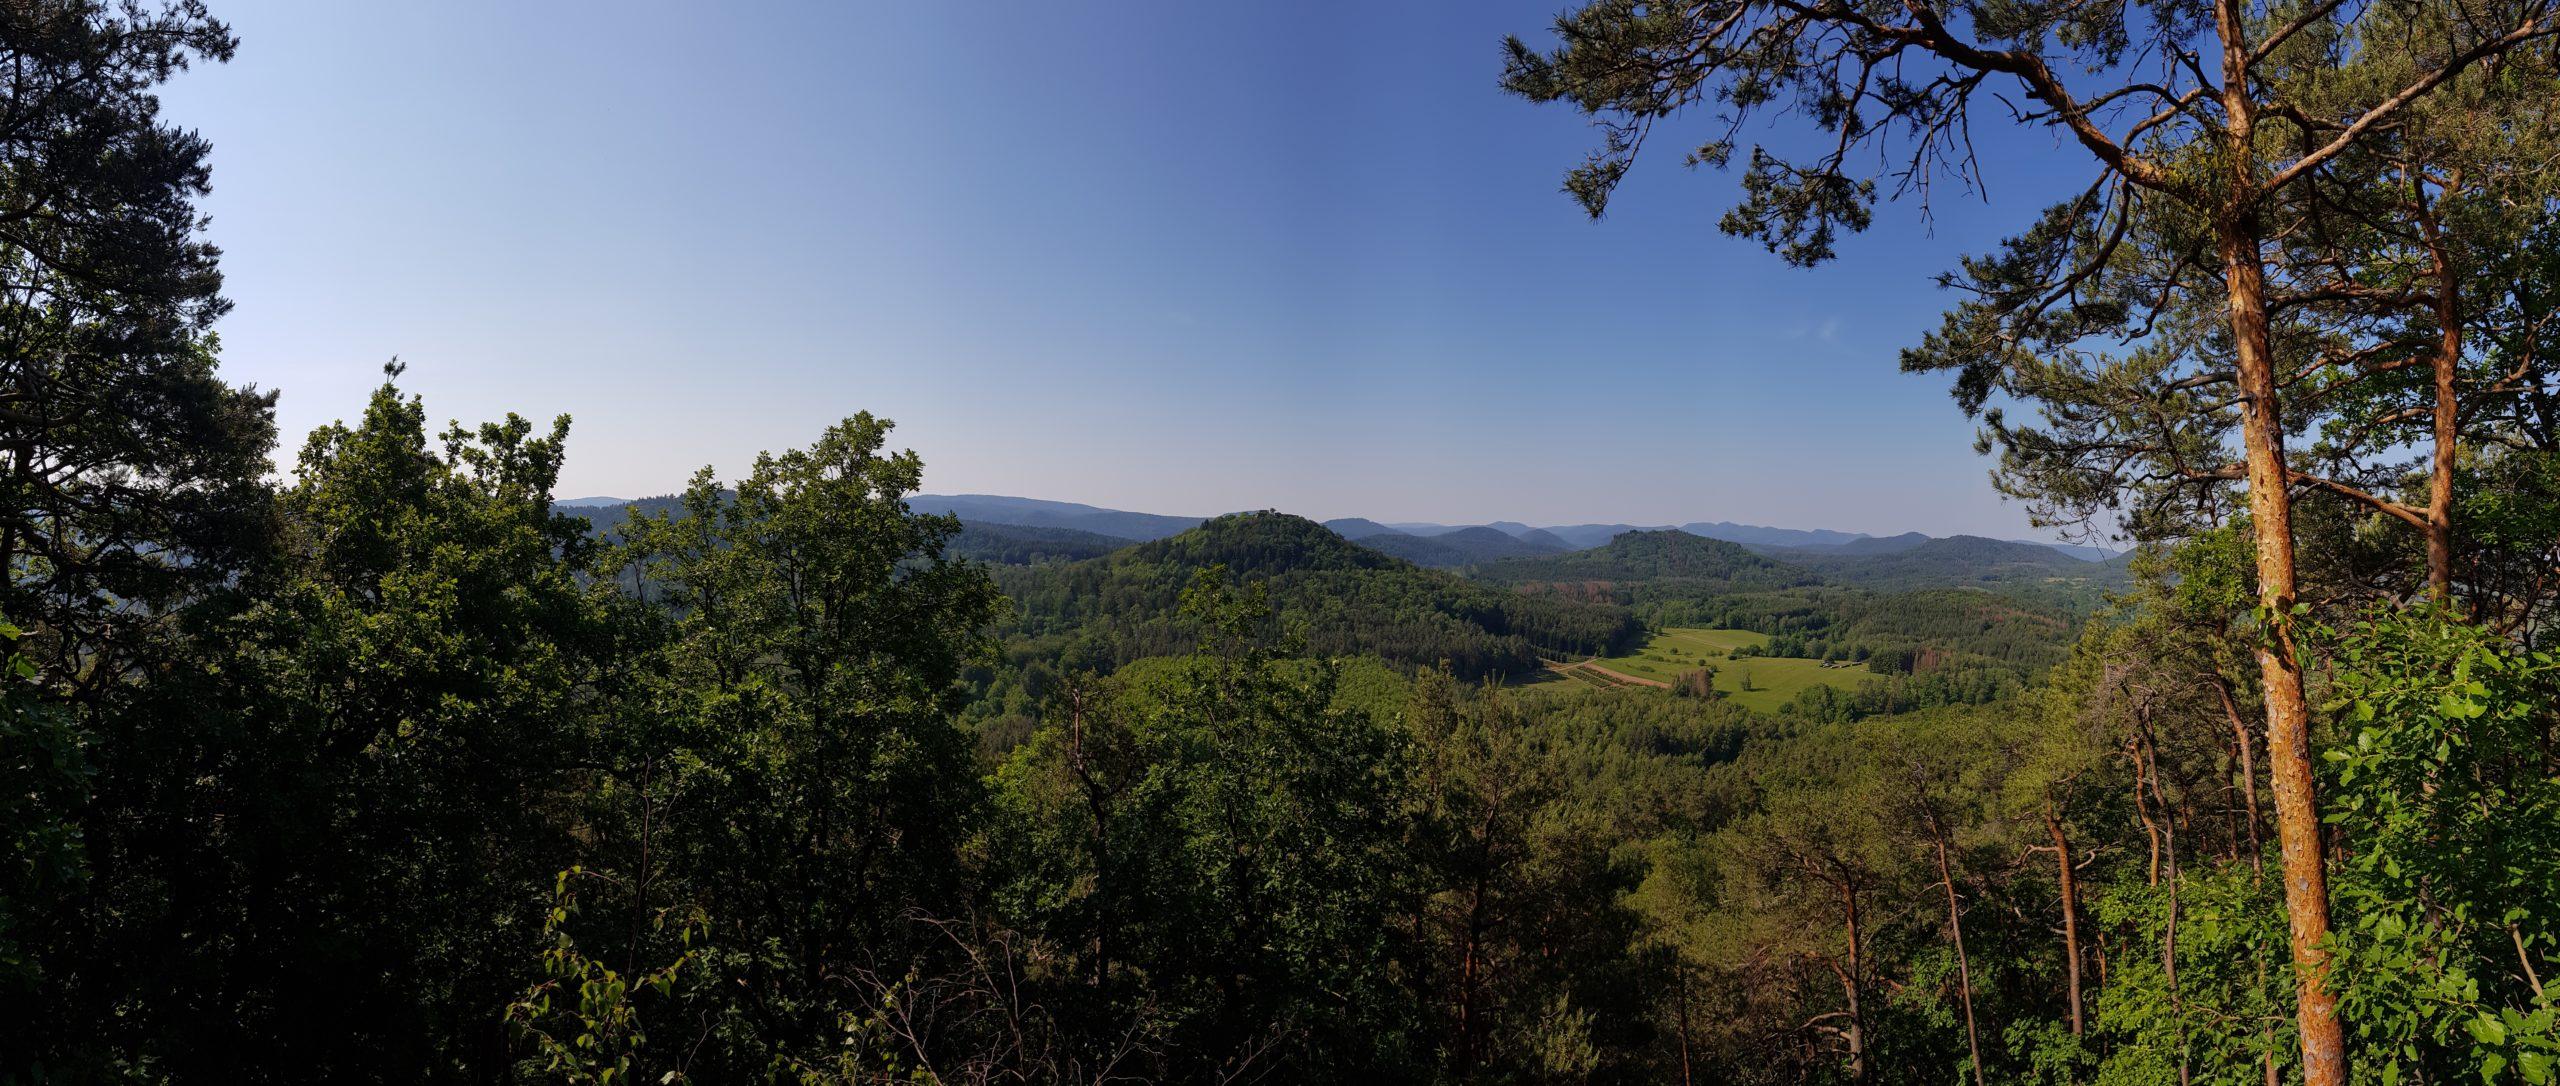 Ausblick in den Pfälzer Wald